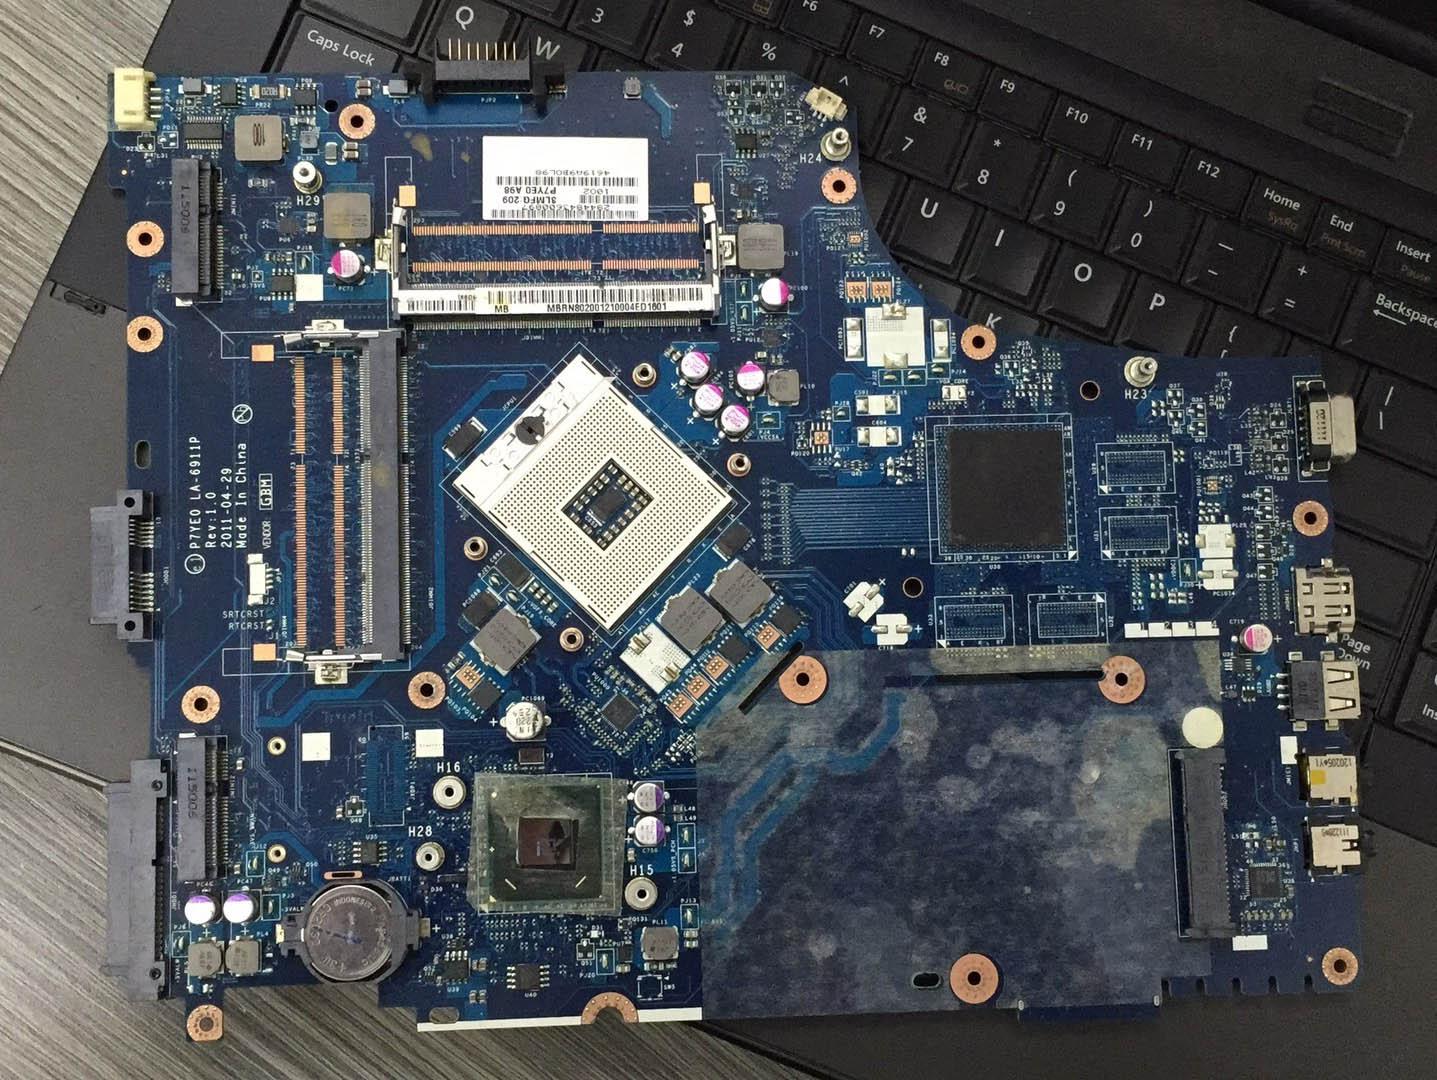 For Acer Aspire 7750 AS7750 7750Z 7750G Laptop Motherboard Notebook Pc Mainboard Main Board HM65 P7YE0 LA-6911P Rev 1.0 Test Ok